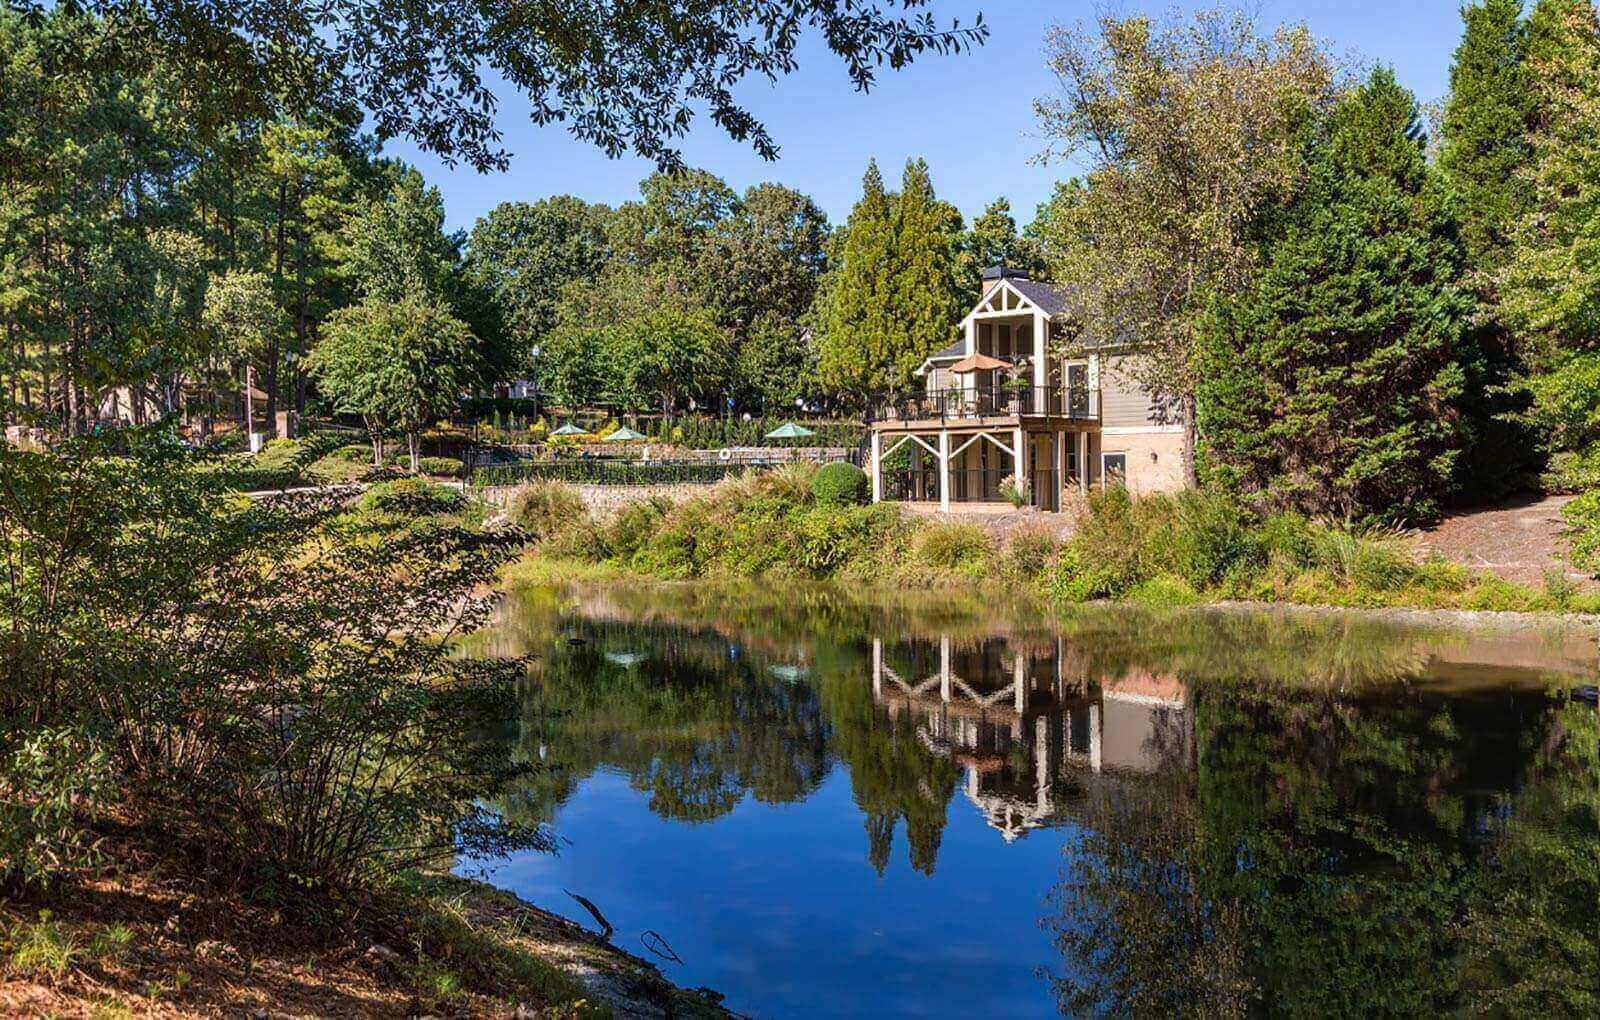 Serene Pond at 670 thornton, Lithia Springs, GA 30122